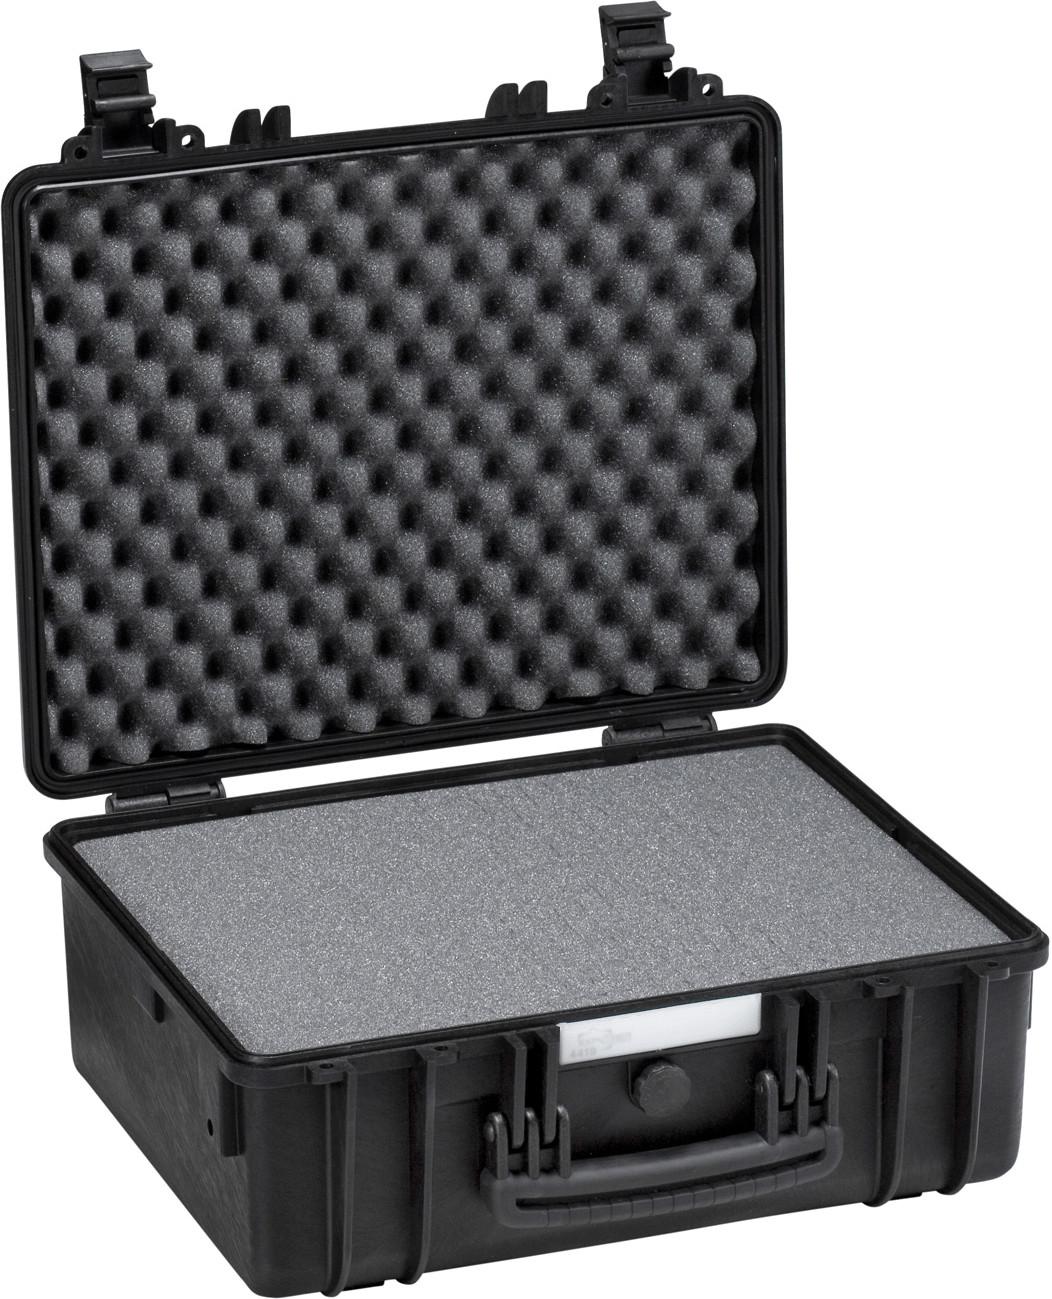 Image of Explorer Cases 4419 Black (with Foam)